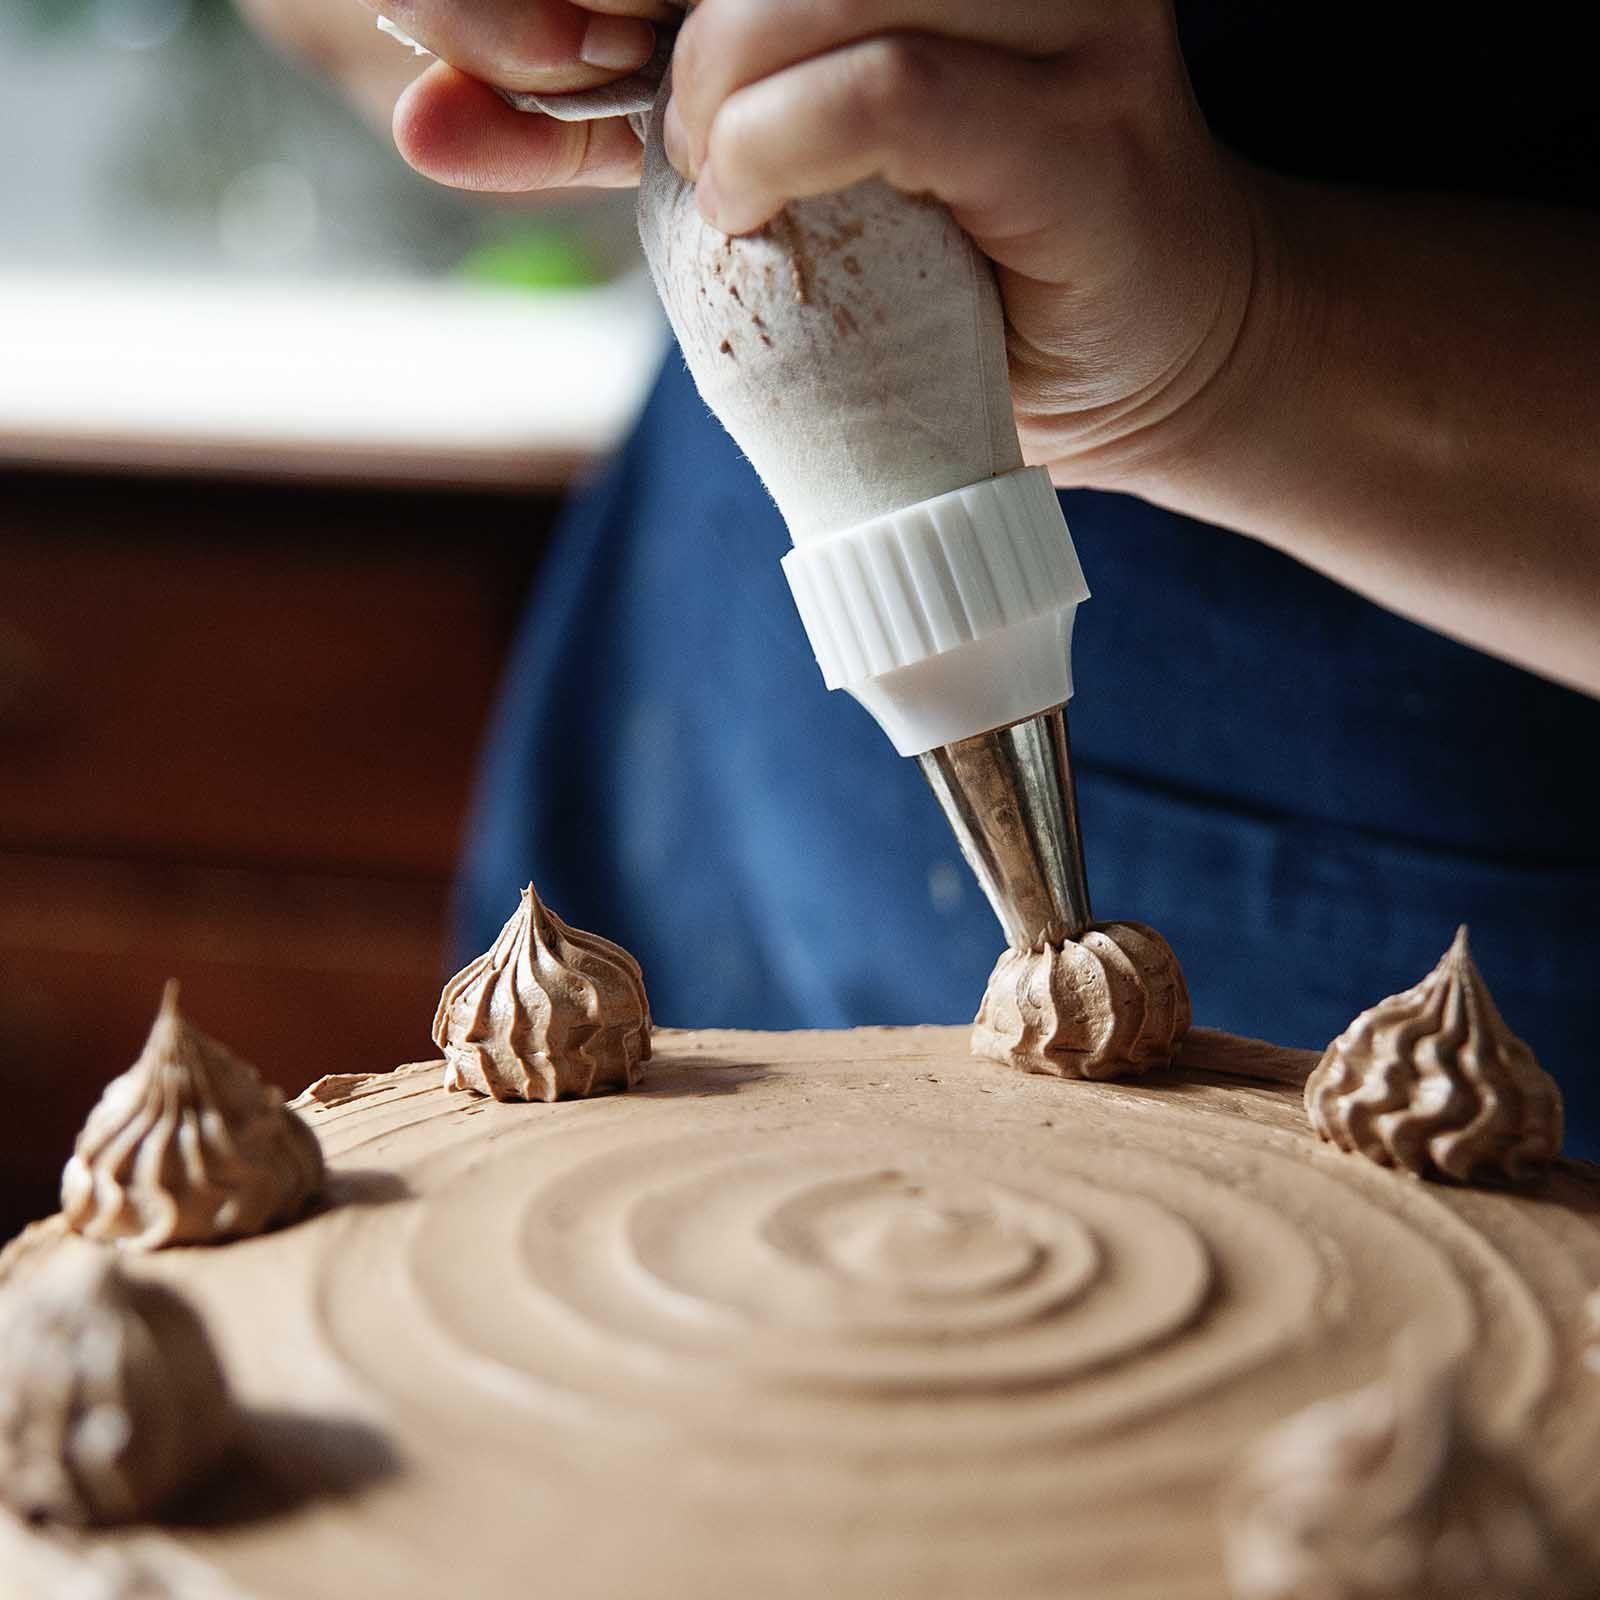 Woman piping Chocolate Swiss Meringue Buttercream on a chocolate layer cake.